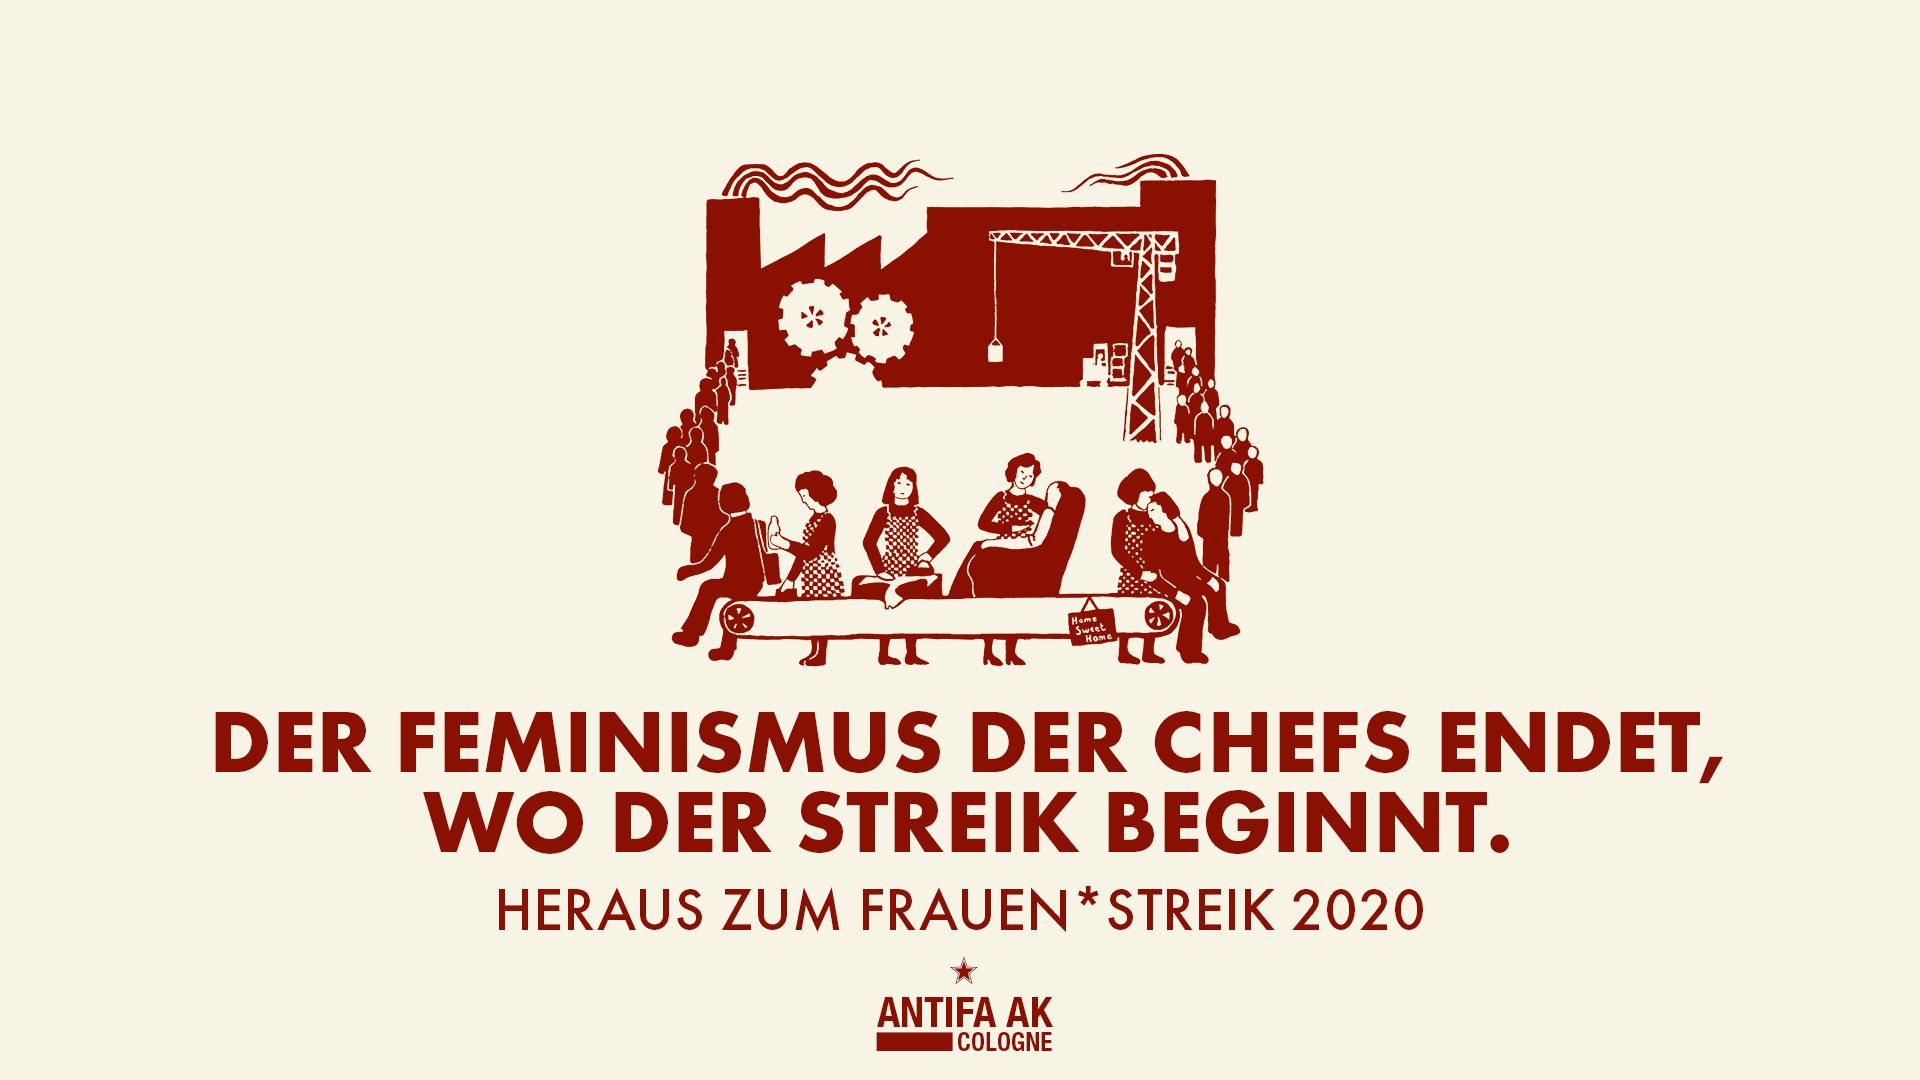 frauen*streik 2020 banner antifa ak